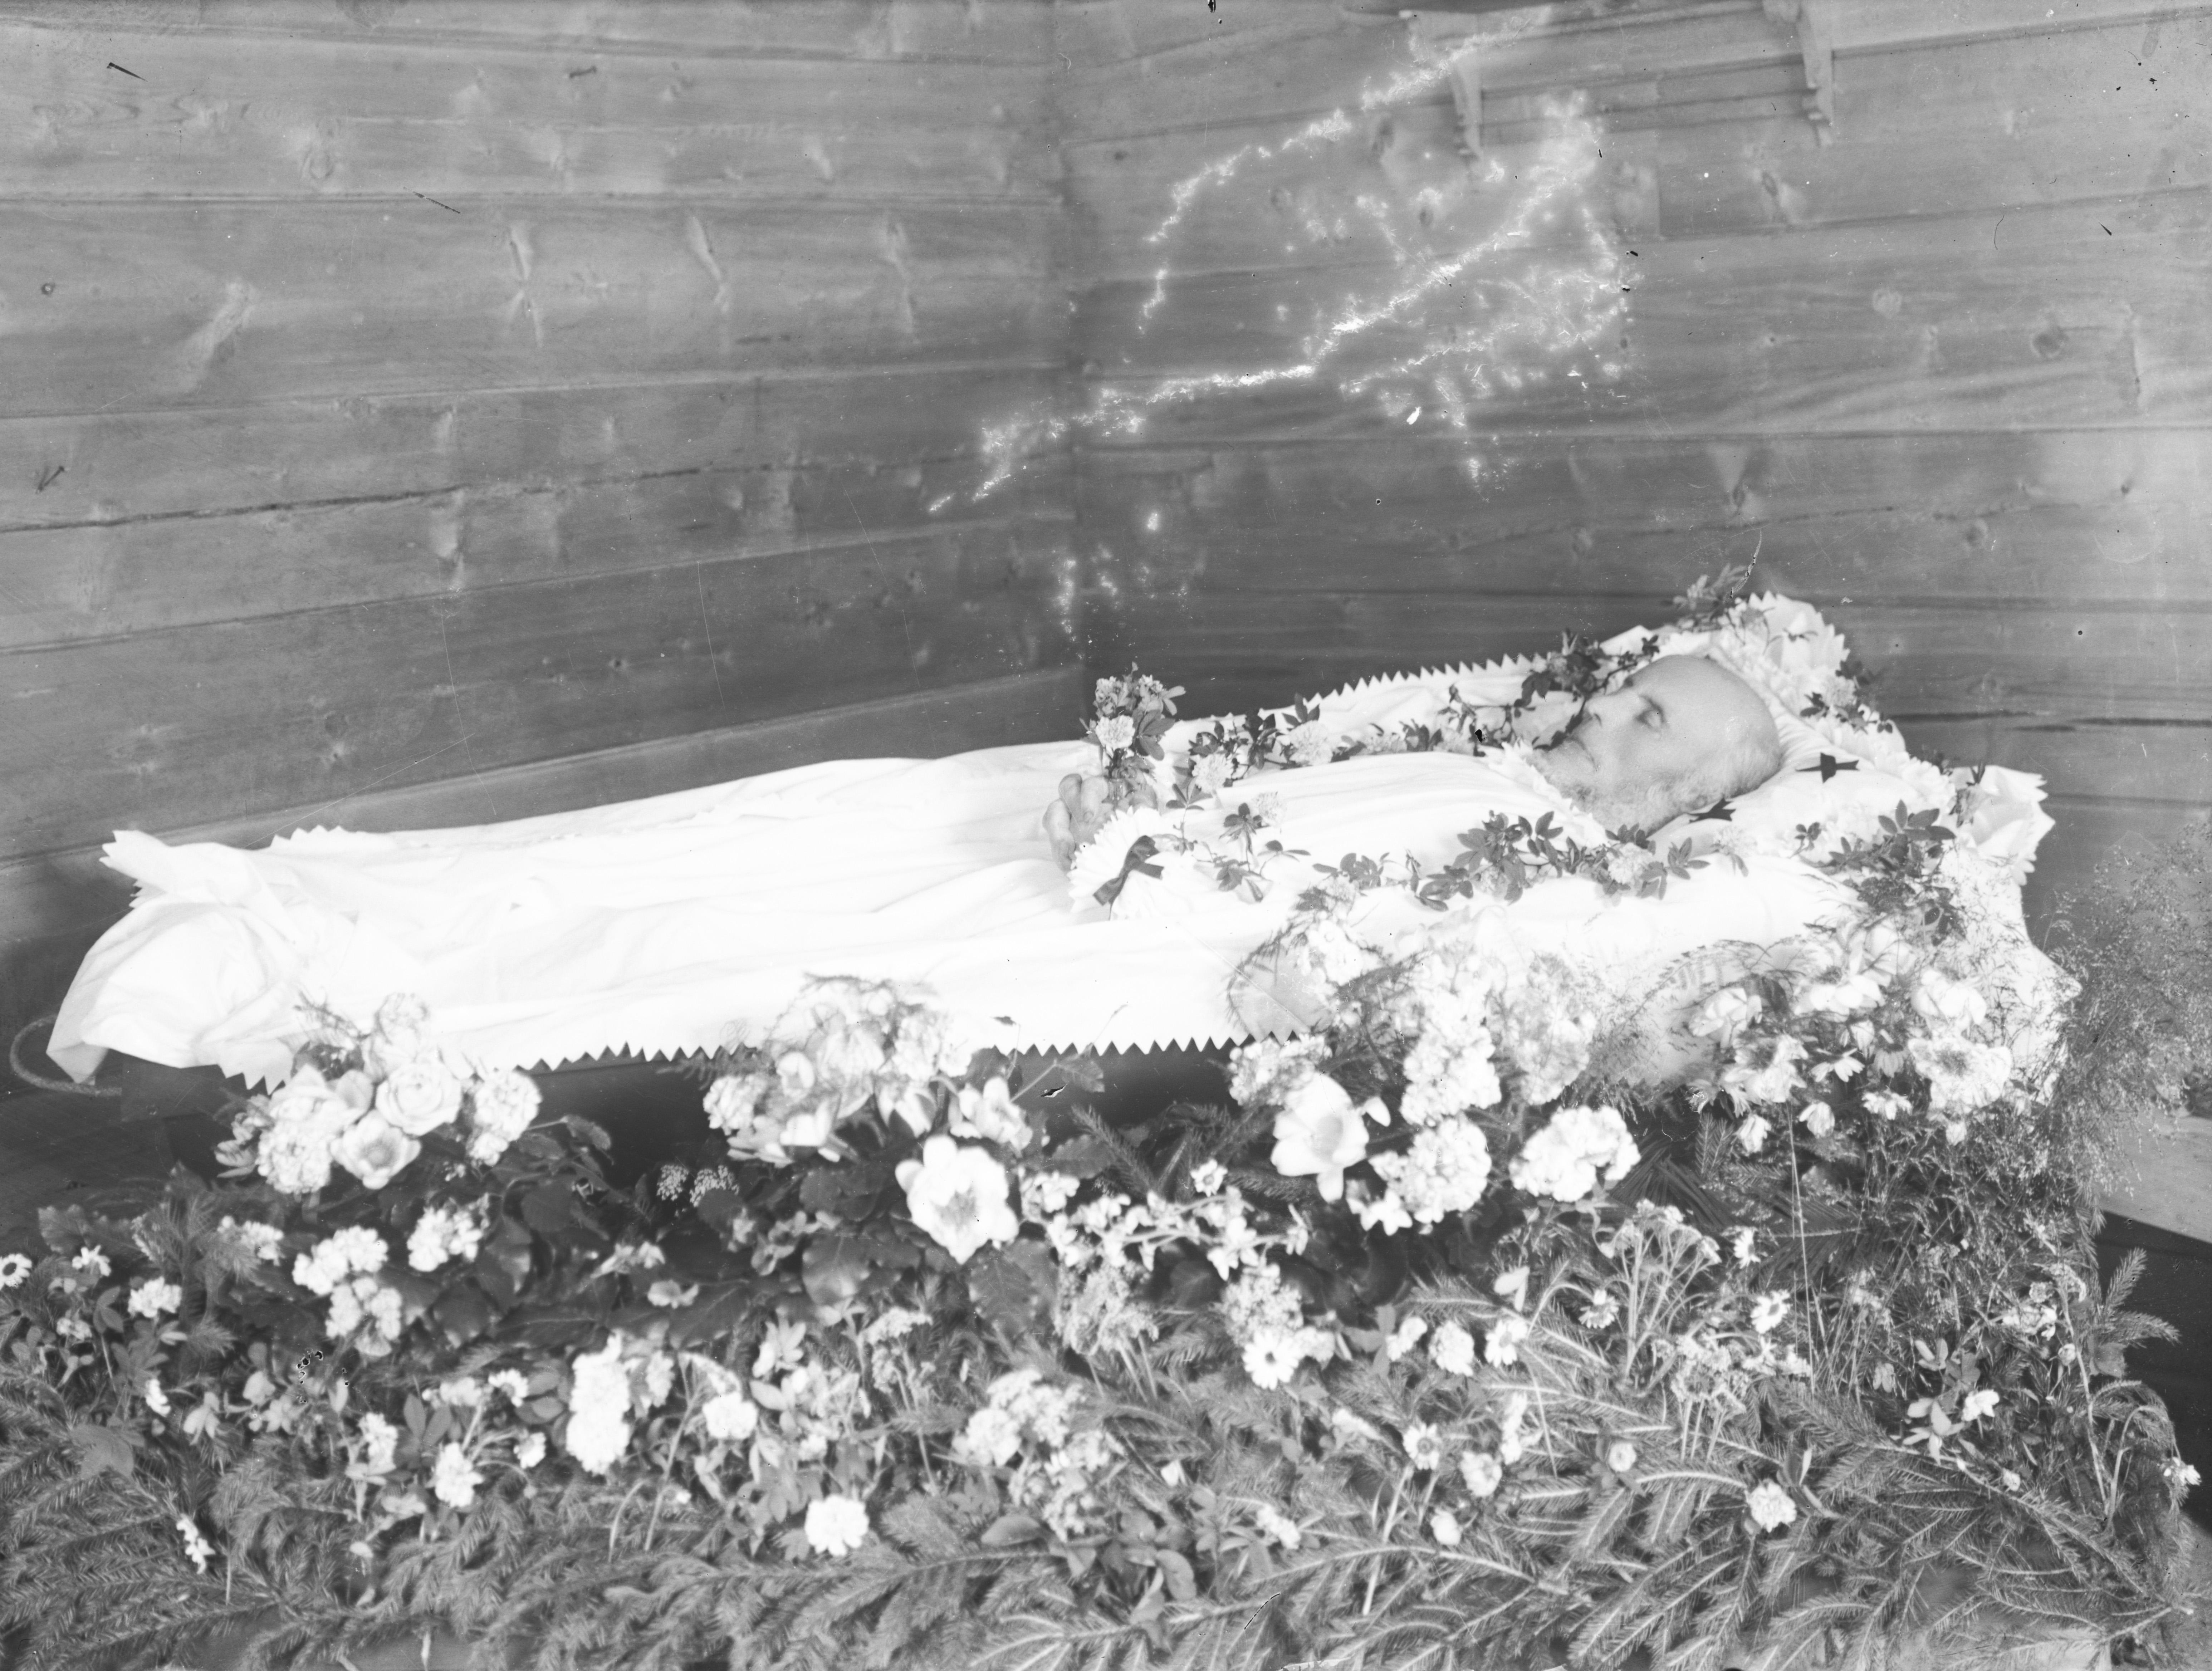 Post mortem portrait of a man, ca. 1910-1930